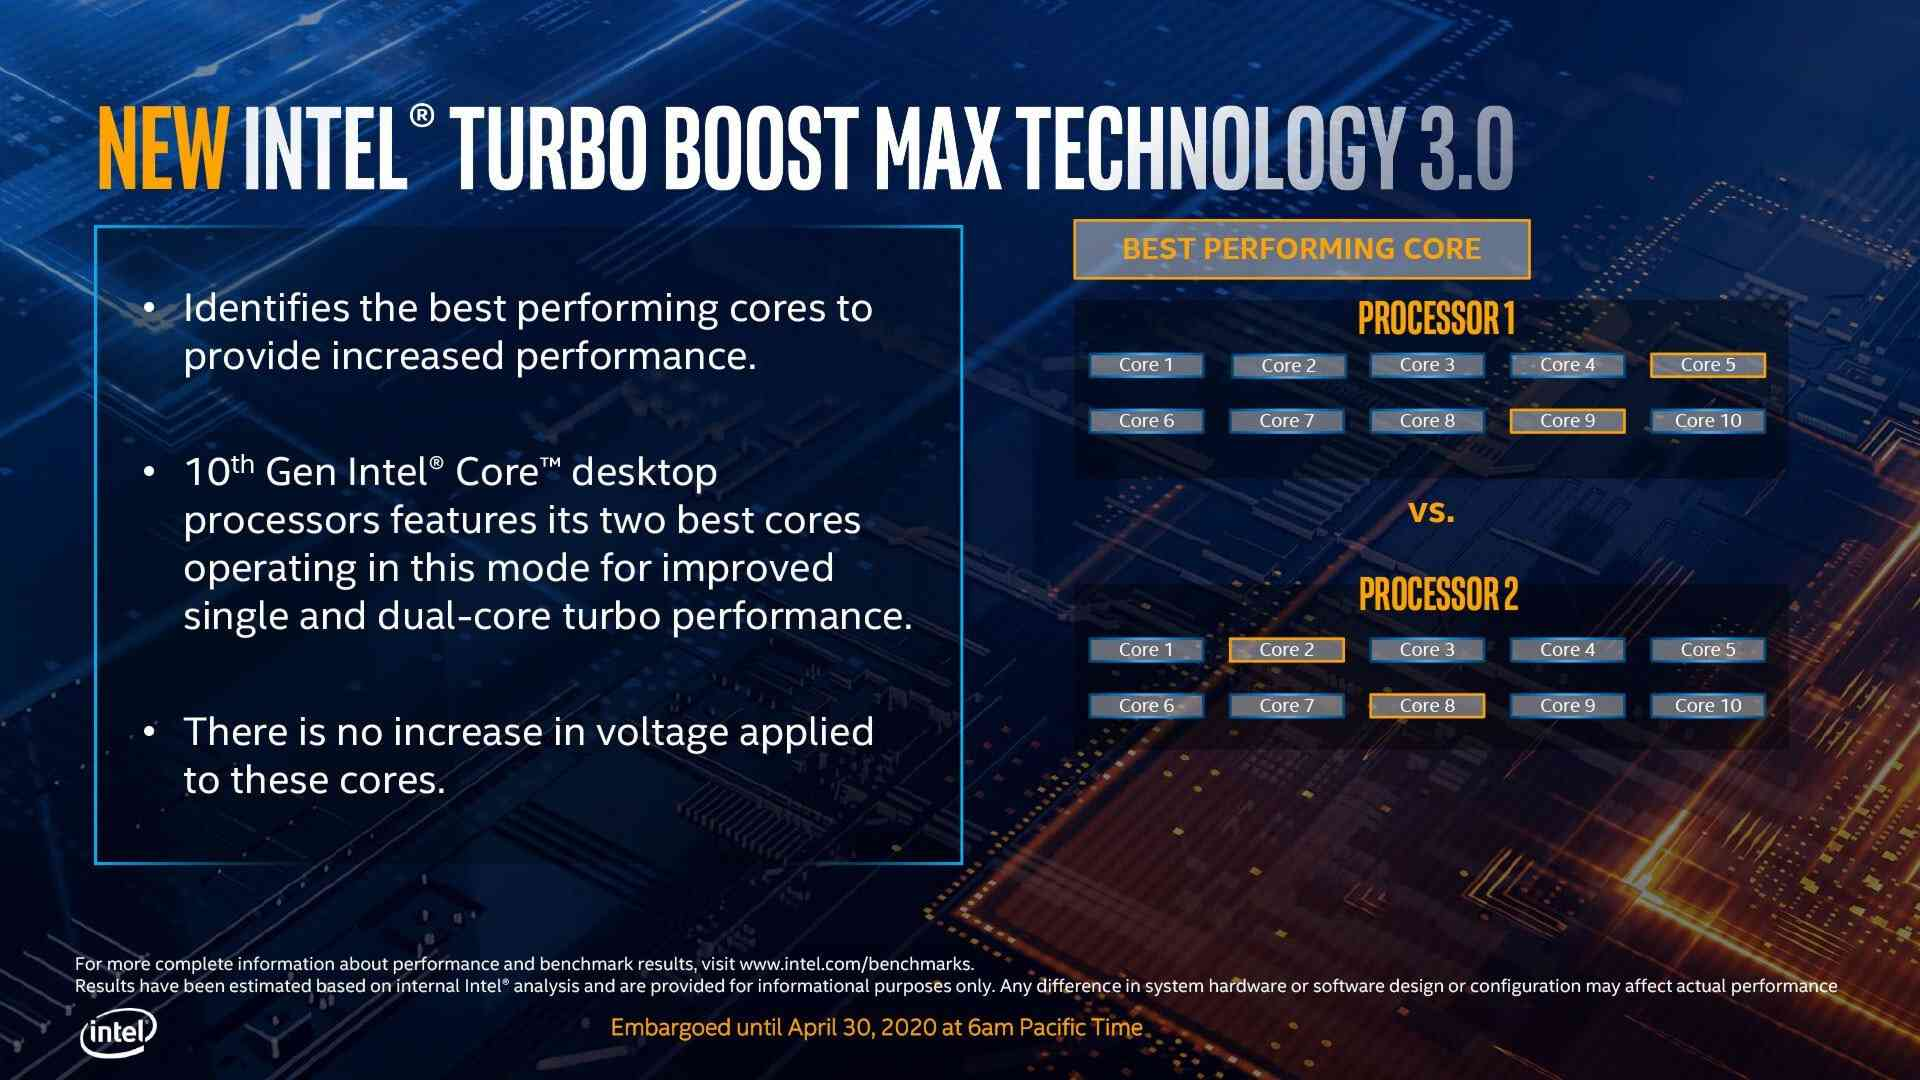 Intel's Turbo Boost Max 3.0 technology.